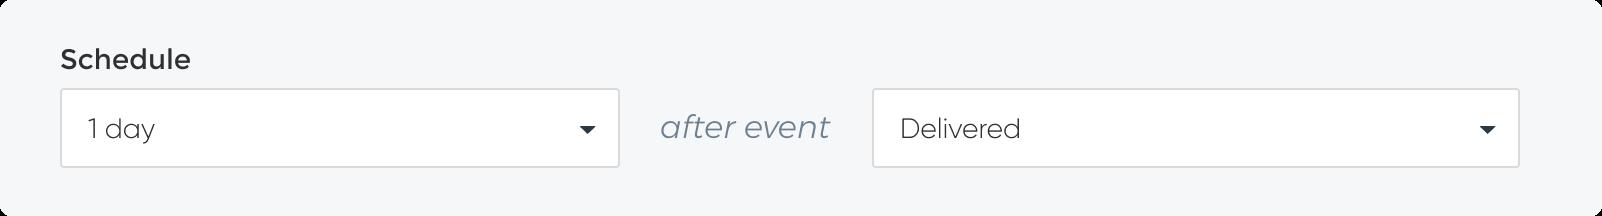 Scheduling Requests